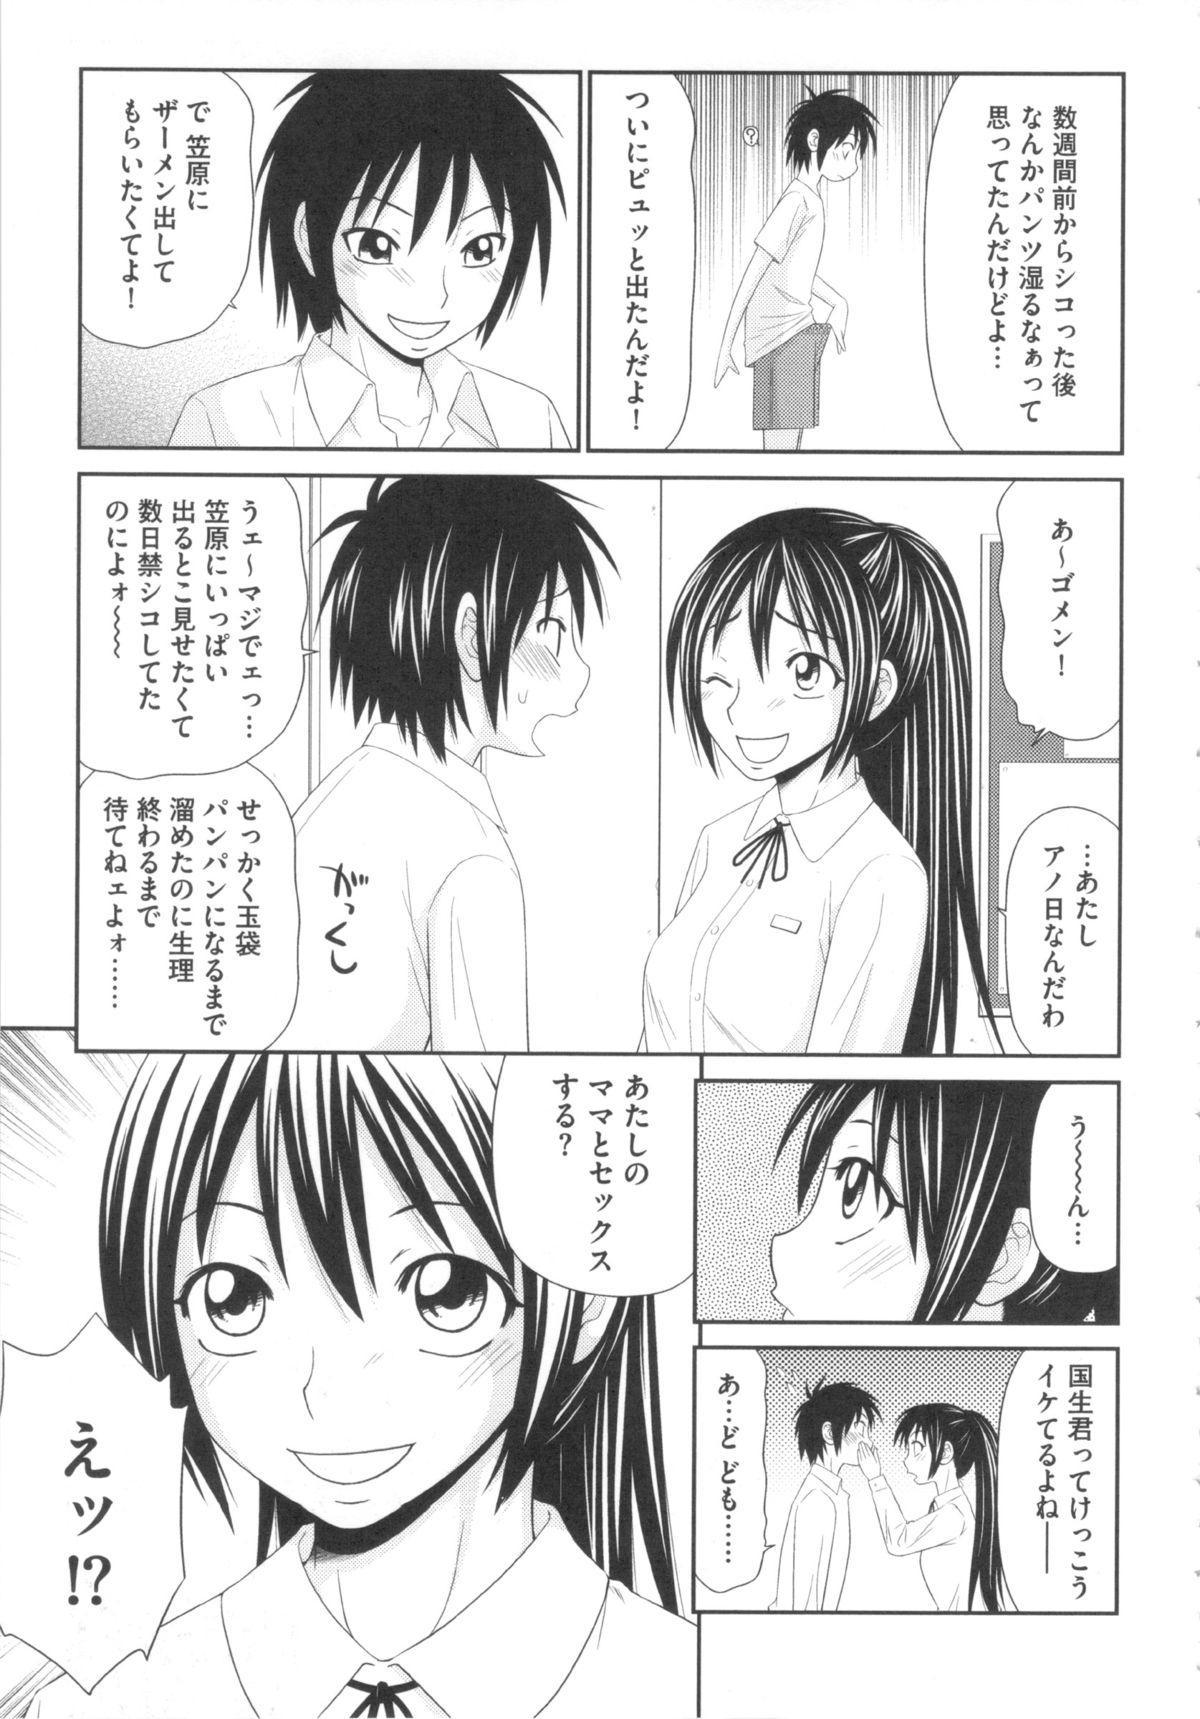 Kiseki No Zaajiru - Sperm of Miracle 149